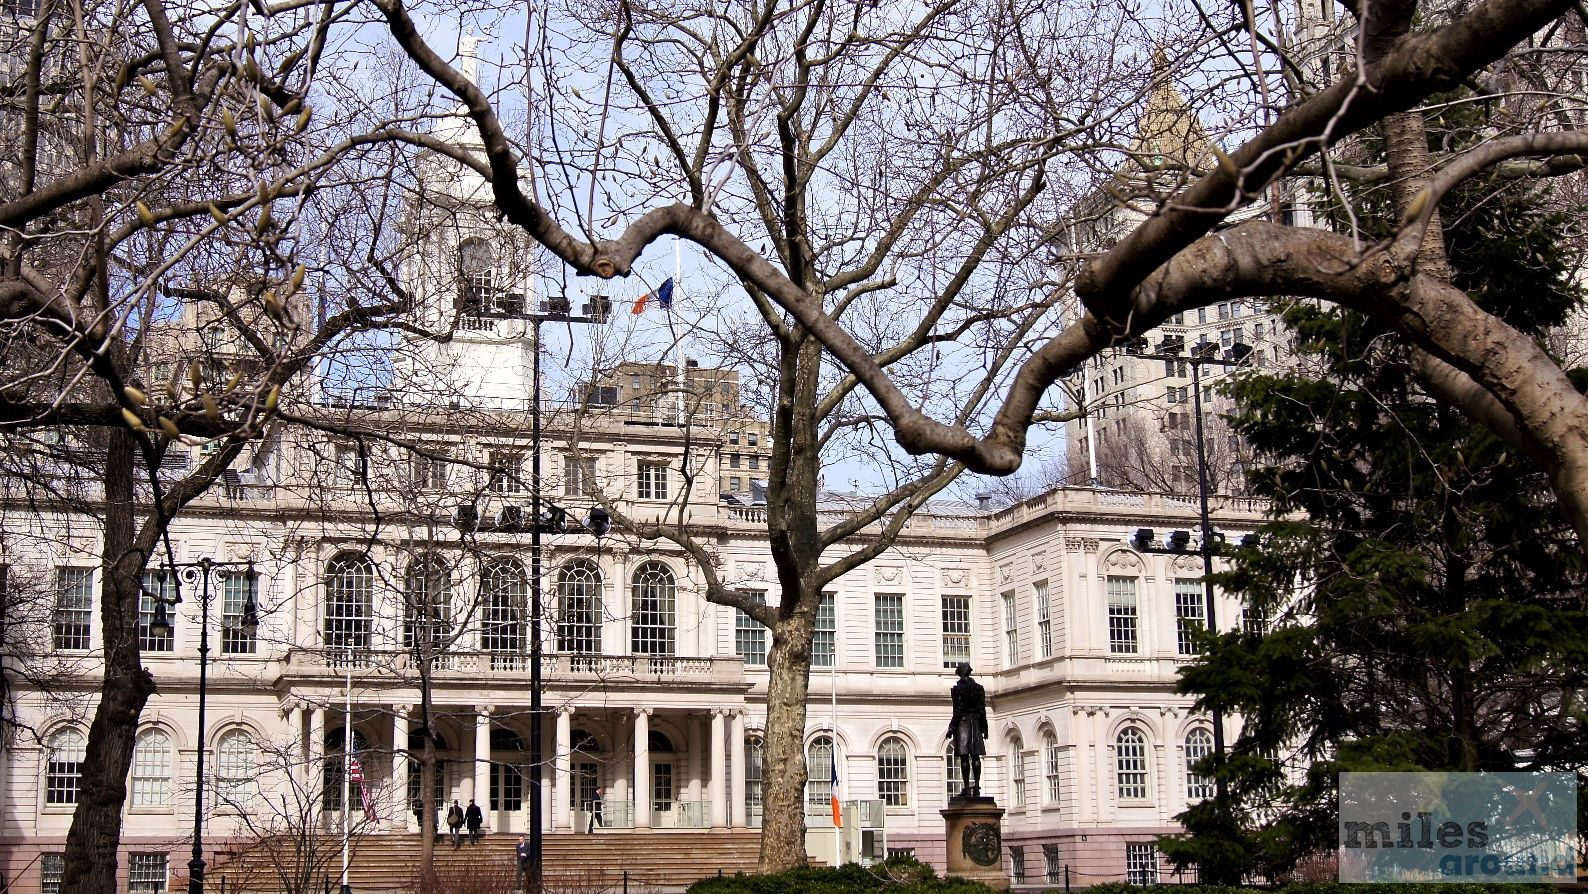 City Hall - Check more at http://www.miles-around.de/nordamerika/usa/new-york/nyc-lower-manhattan-wall-street-und-ground-zero/,  #ChryslerBuilding #CityHall #GrandCentralTerminal #GroundZero #NewYork #NewYorkCity #Reisebericht #TrinityChurch #USA #WallStreet #WorldTradeCenter